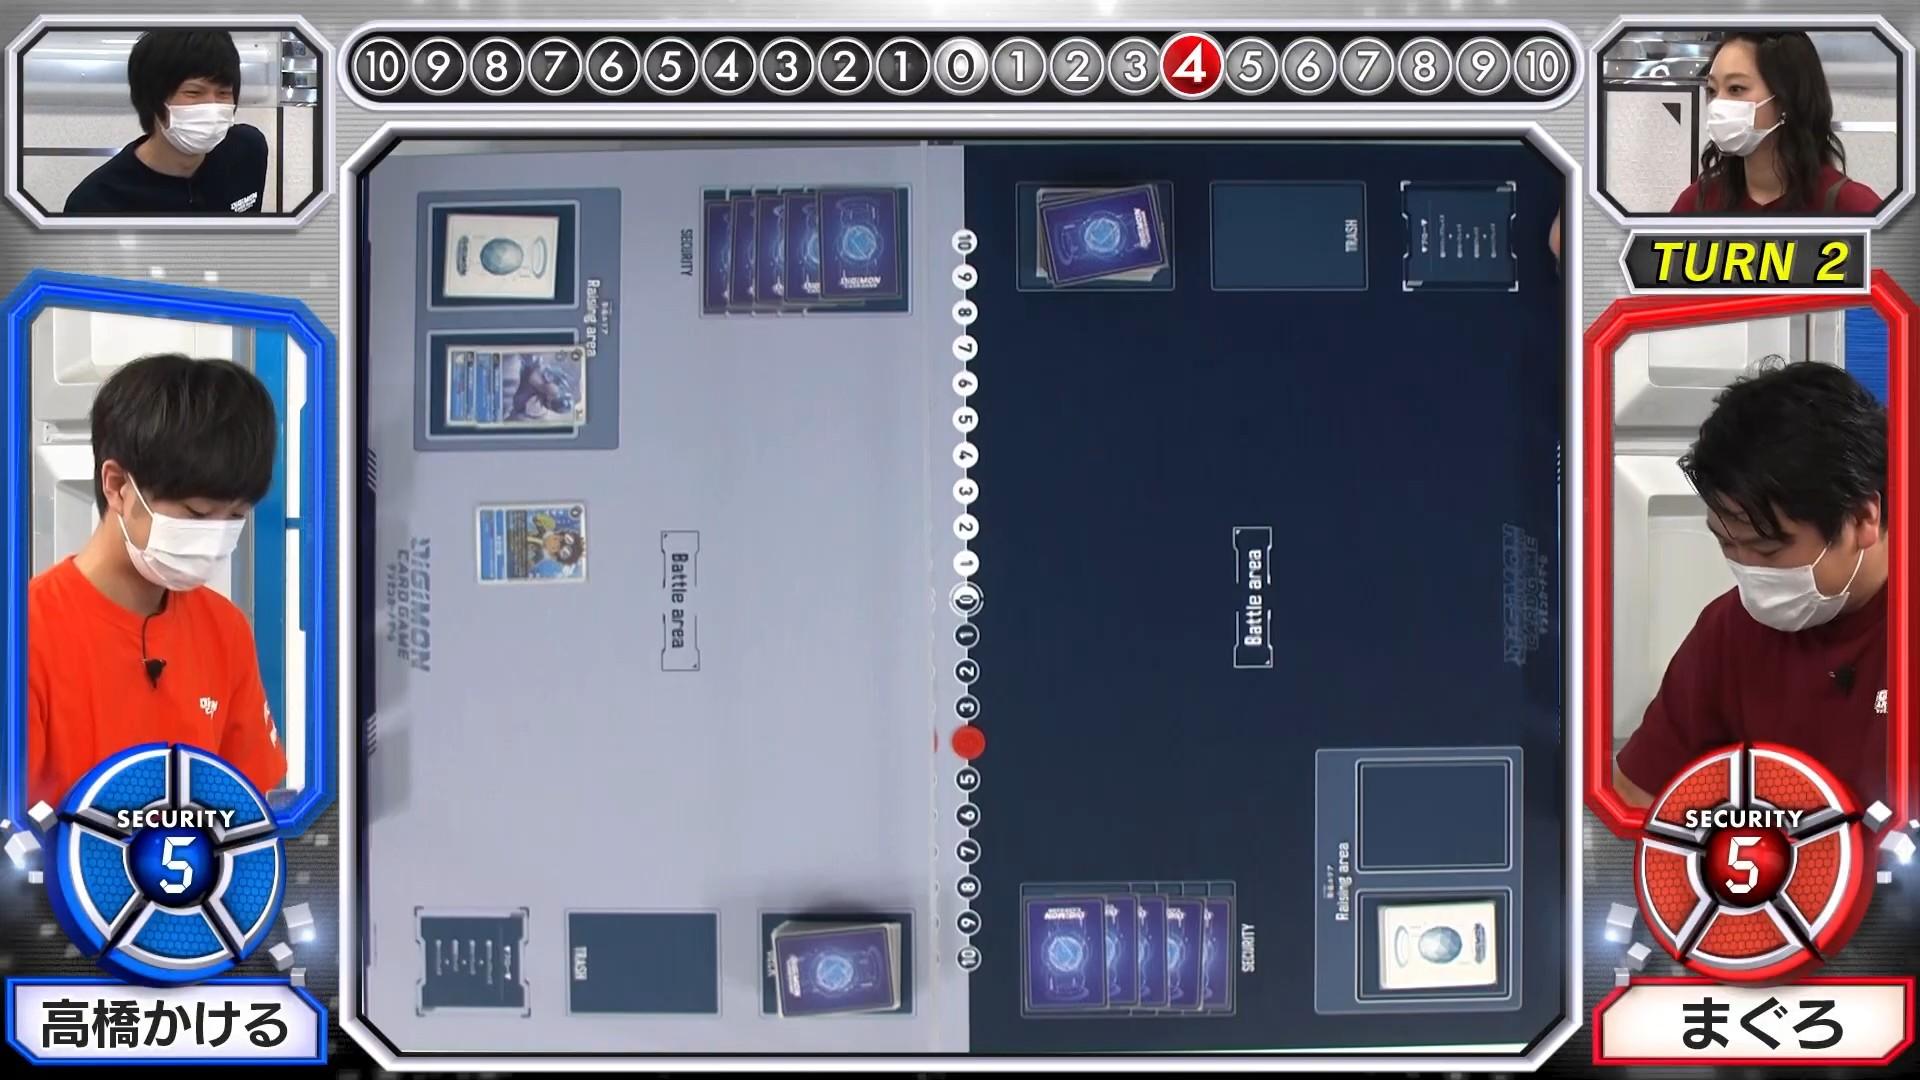 digimoncardbattle_v2_36_03_july1_2021.jpg